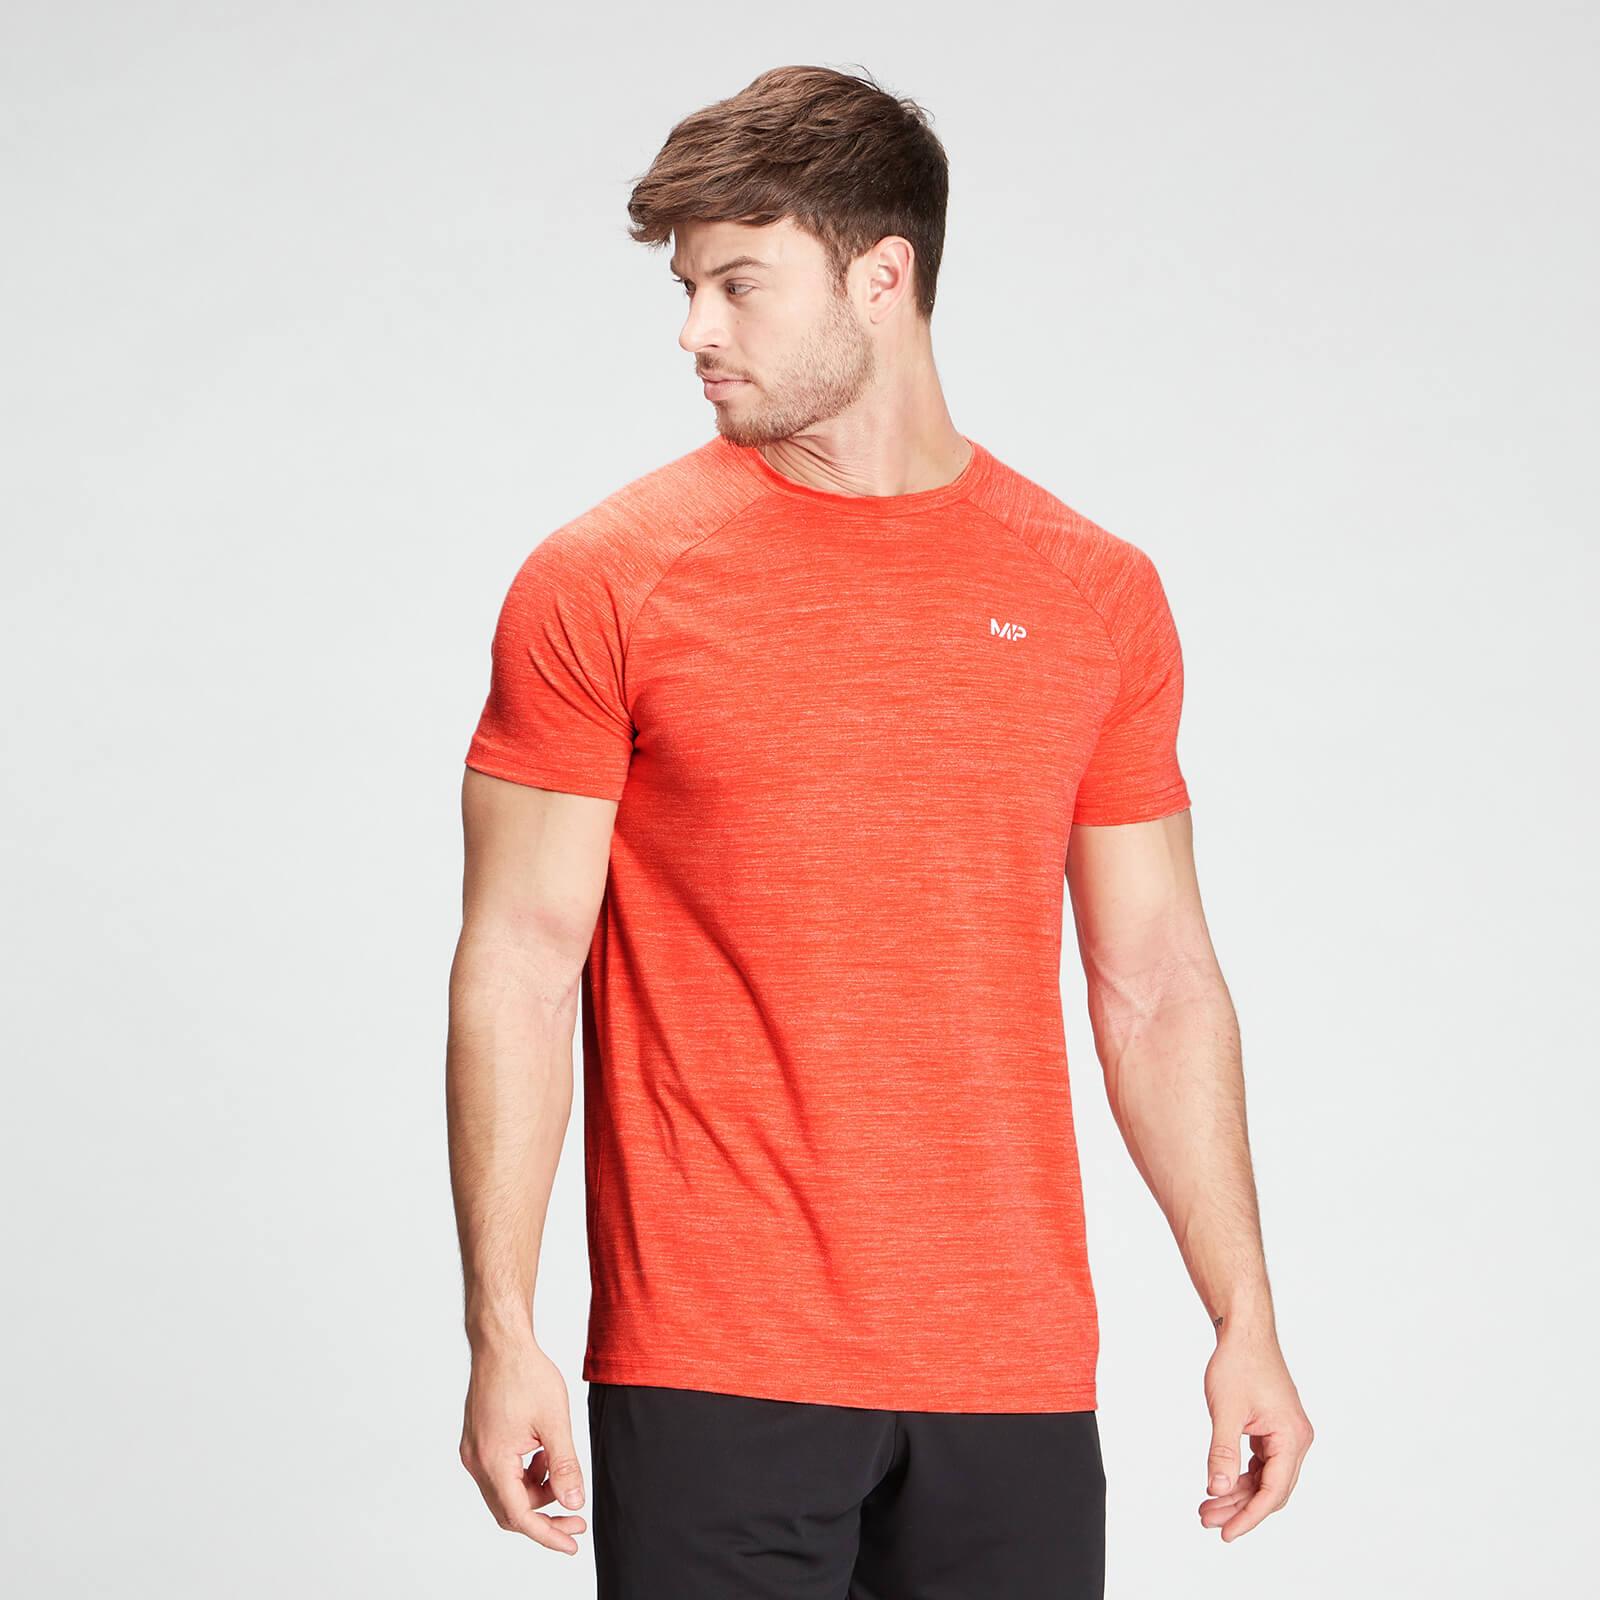 Купить MP Men's Performance Short Sleeve T-Shirt - Fire Marl - XXL, Myprotein International